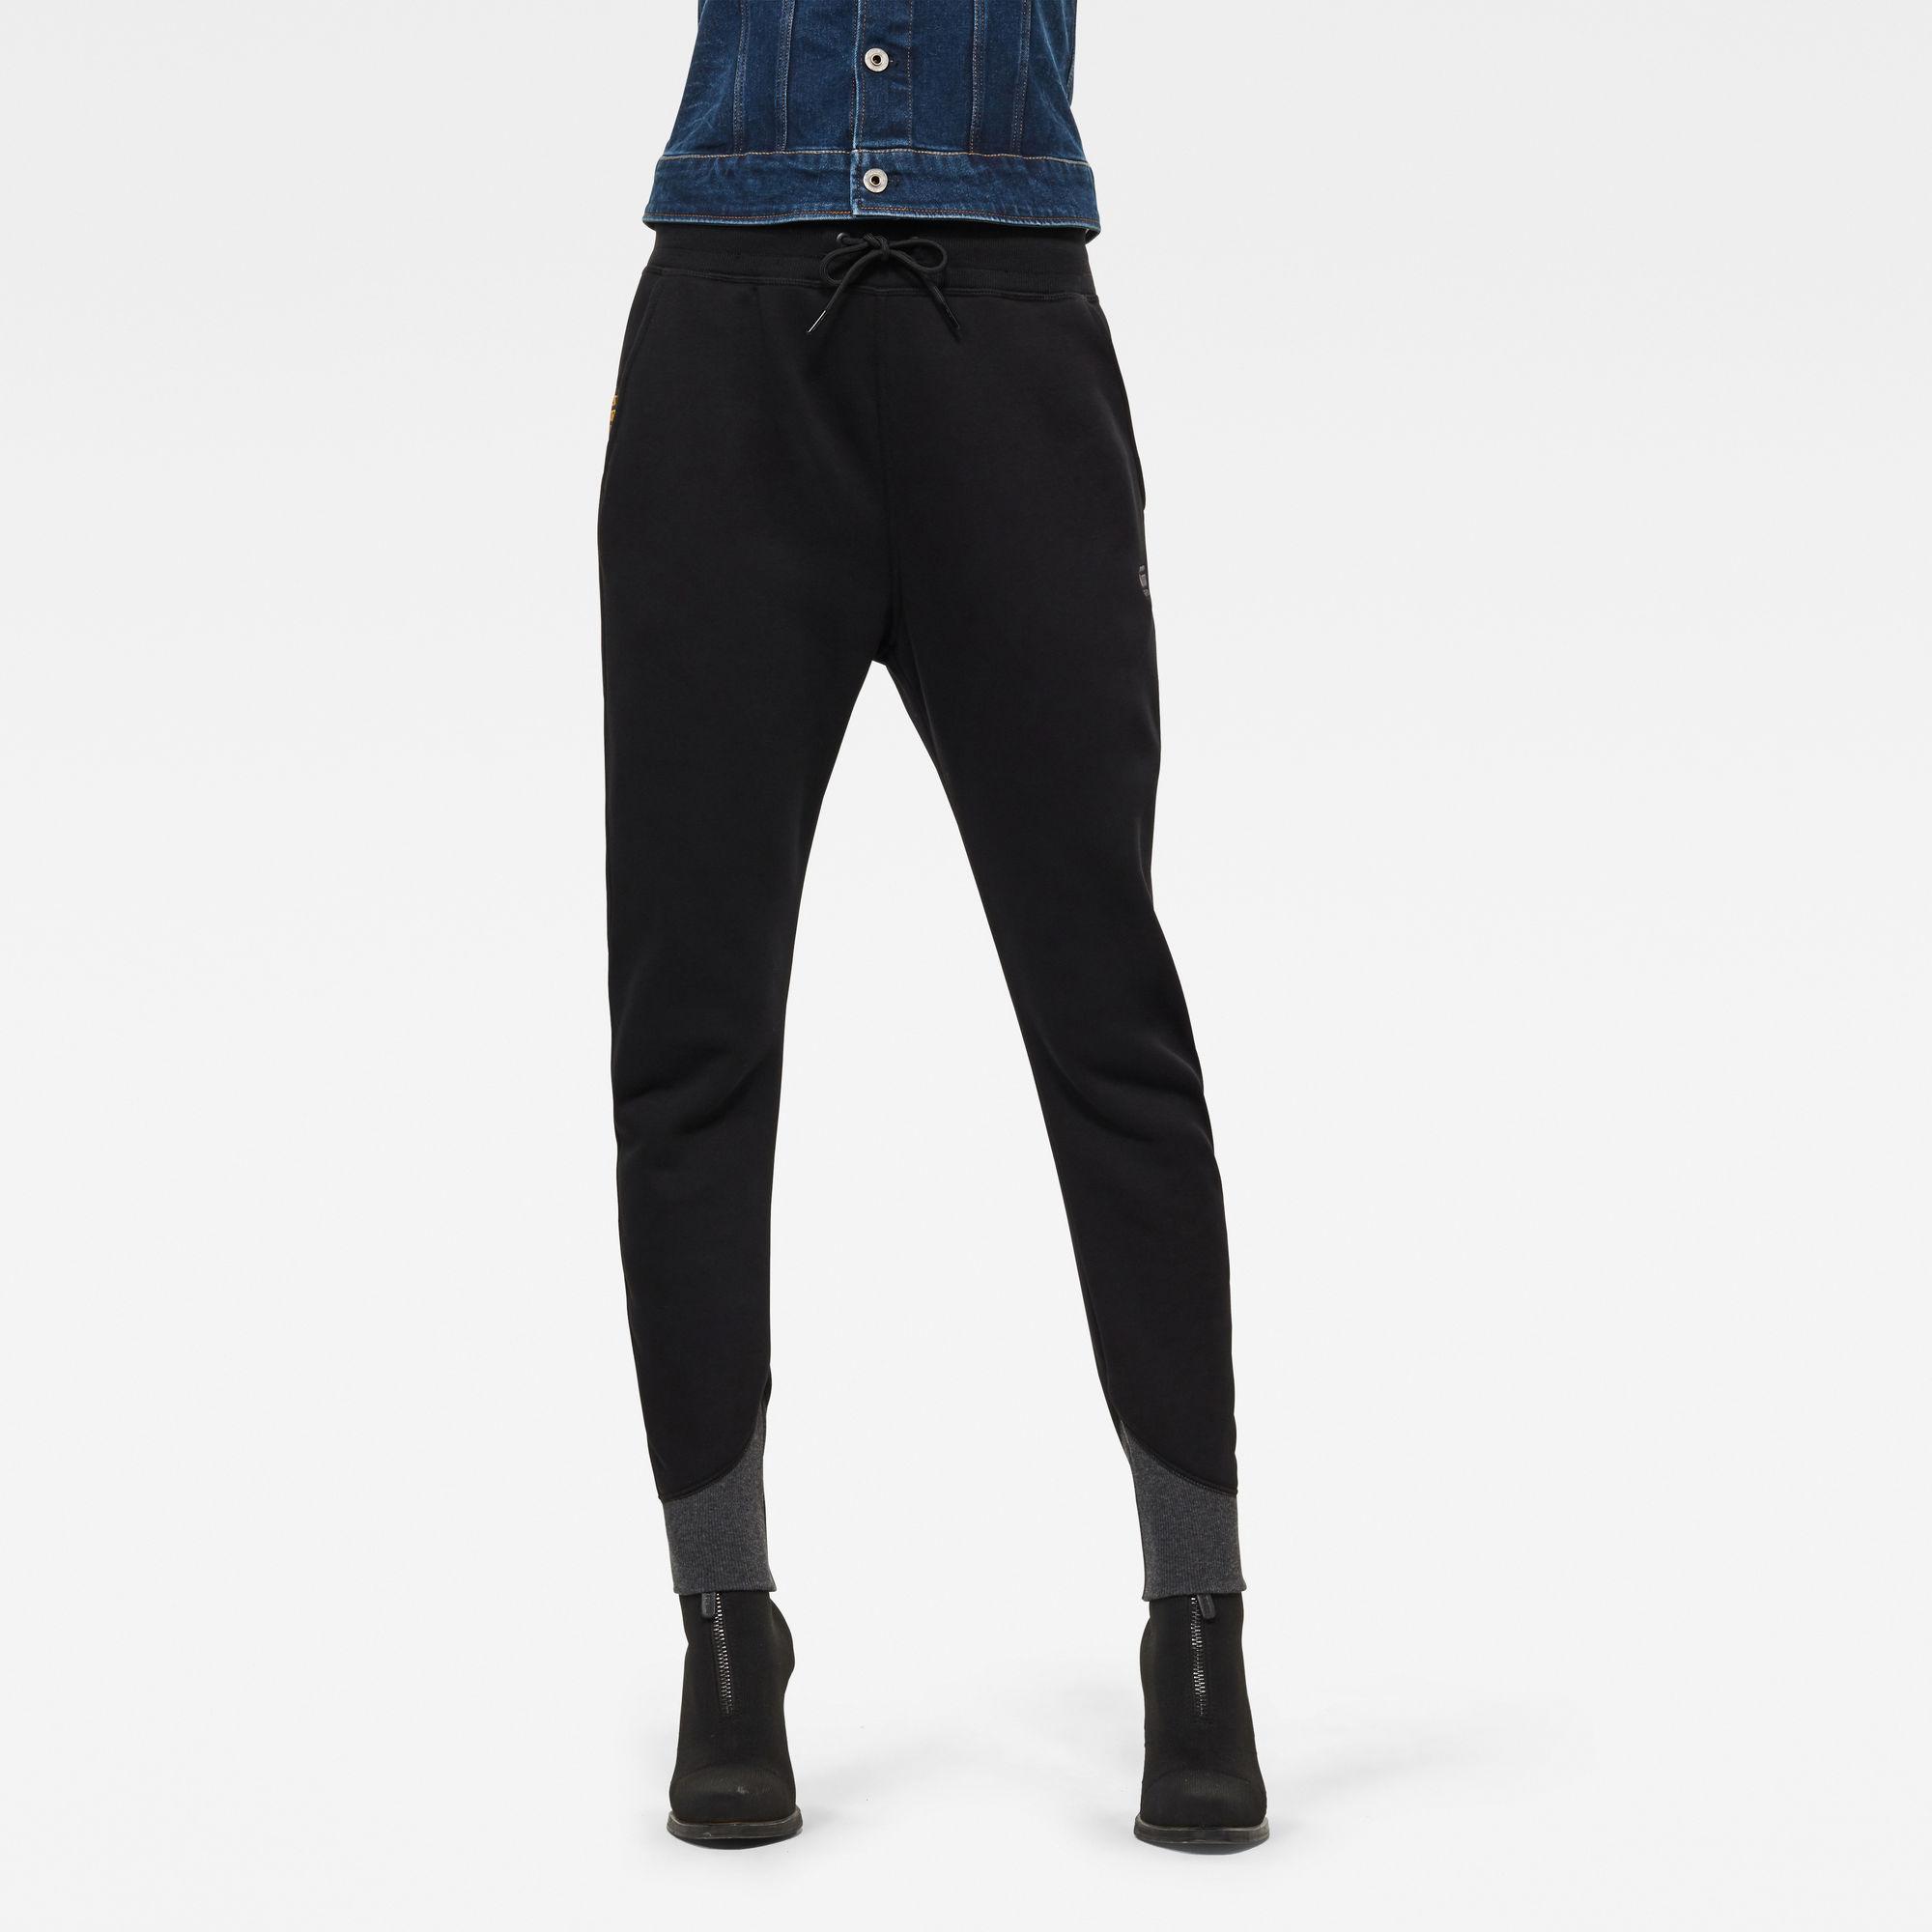 G-Star RAW Dames Premium core 3D Tapered Sweatpants Zwart